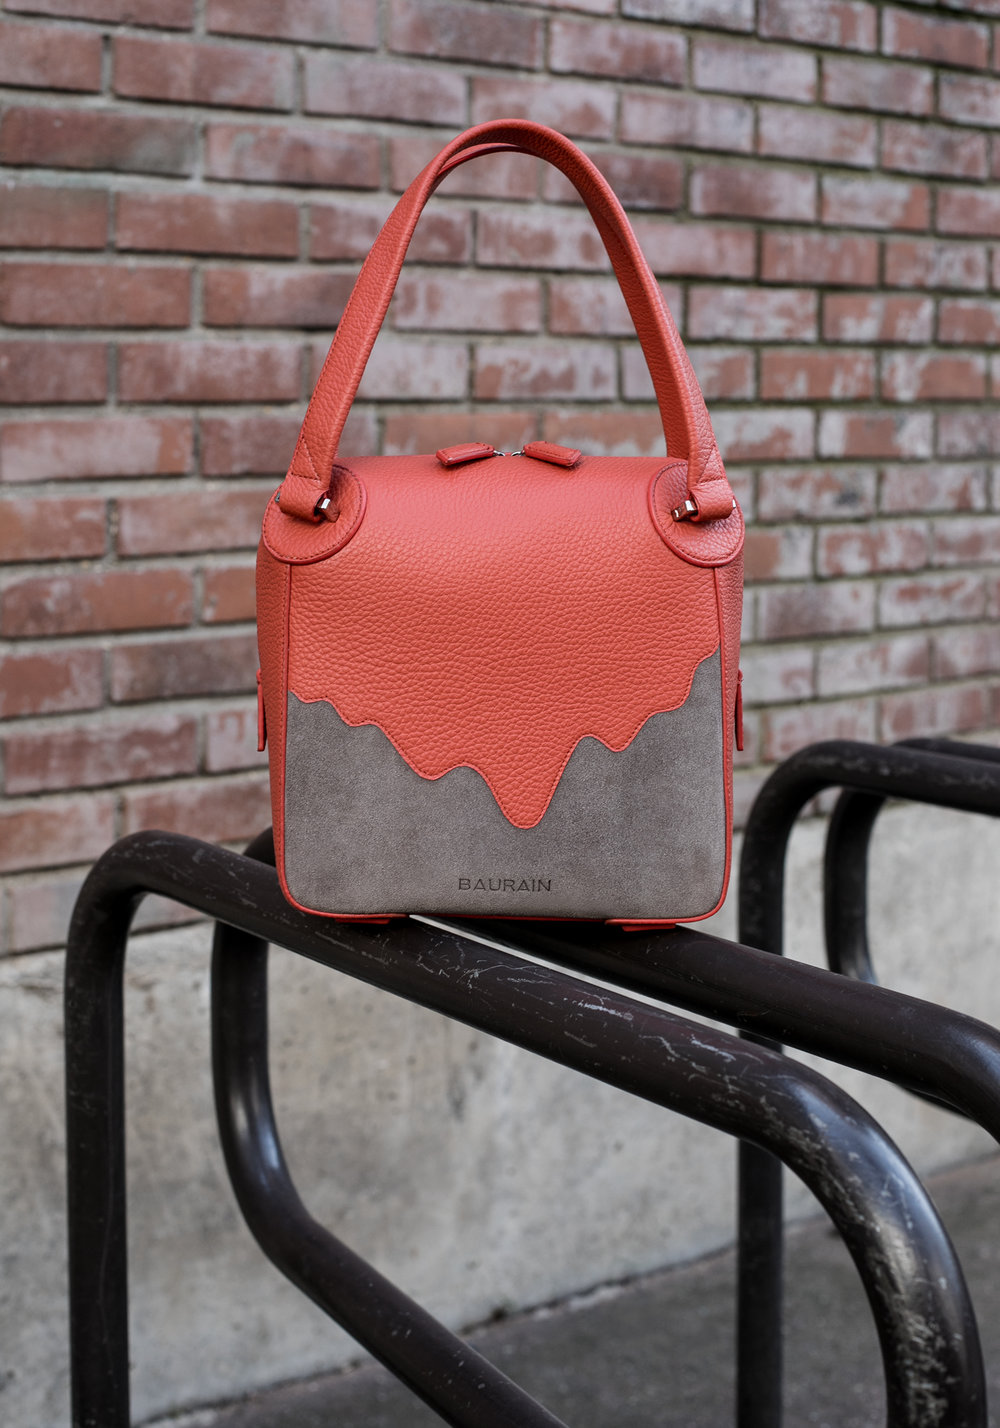 BAURAIN FW18 one small duffel bag